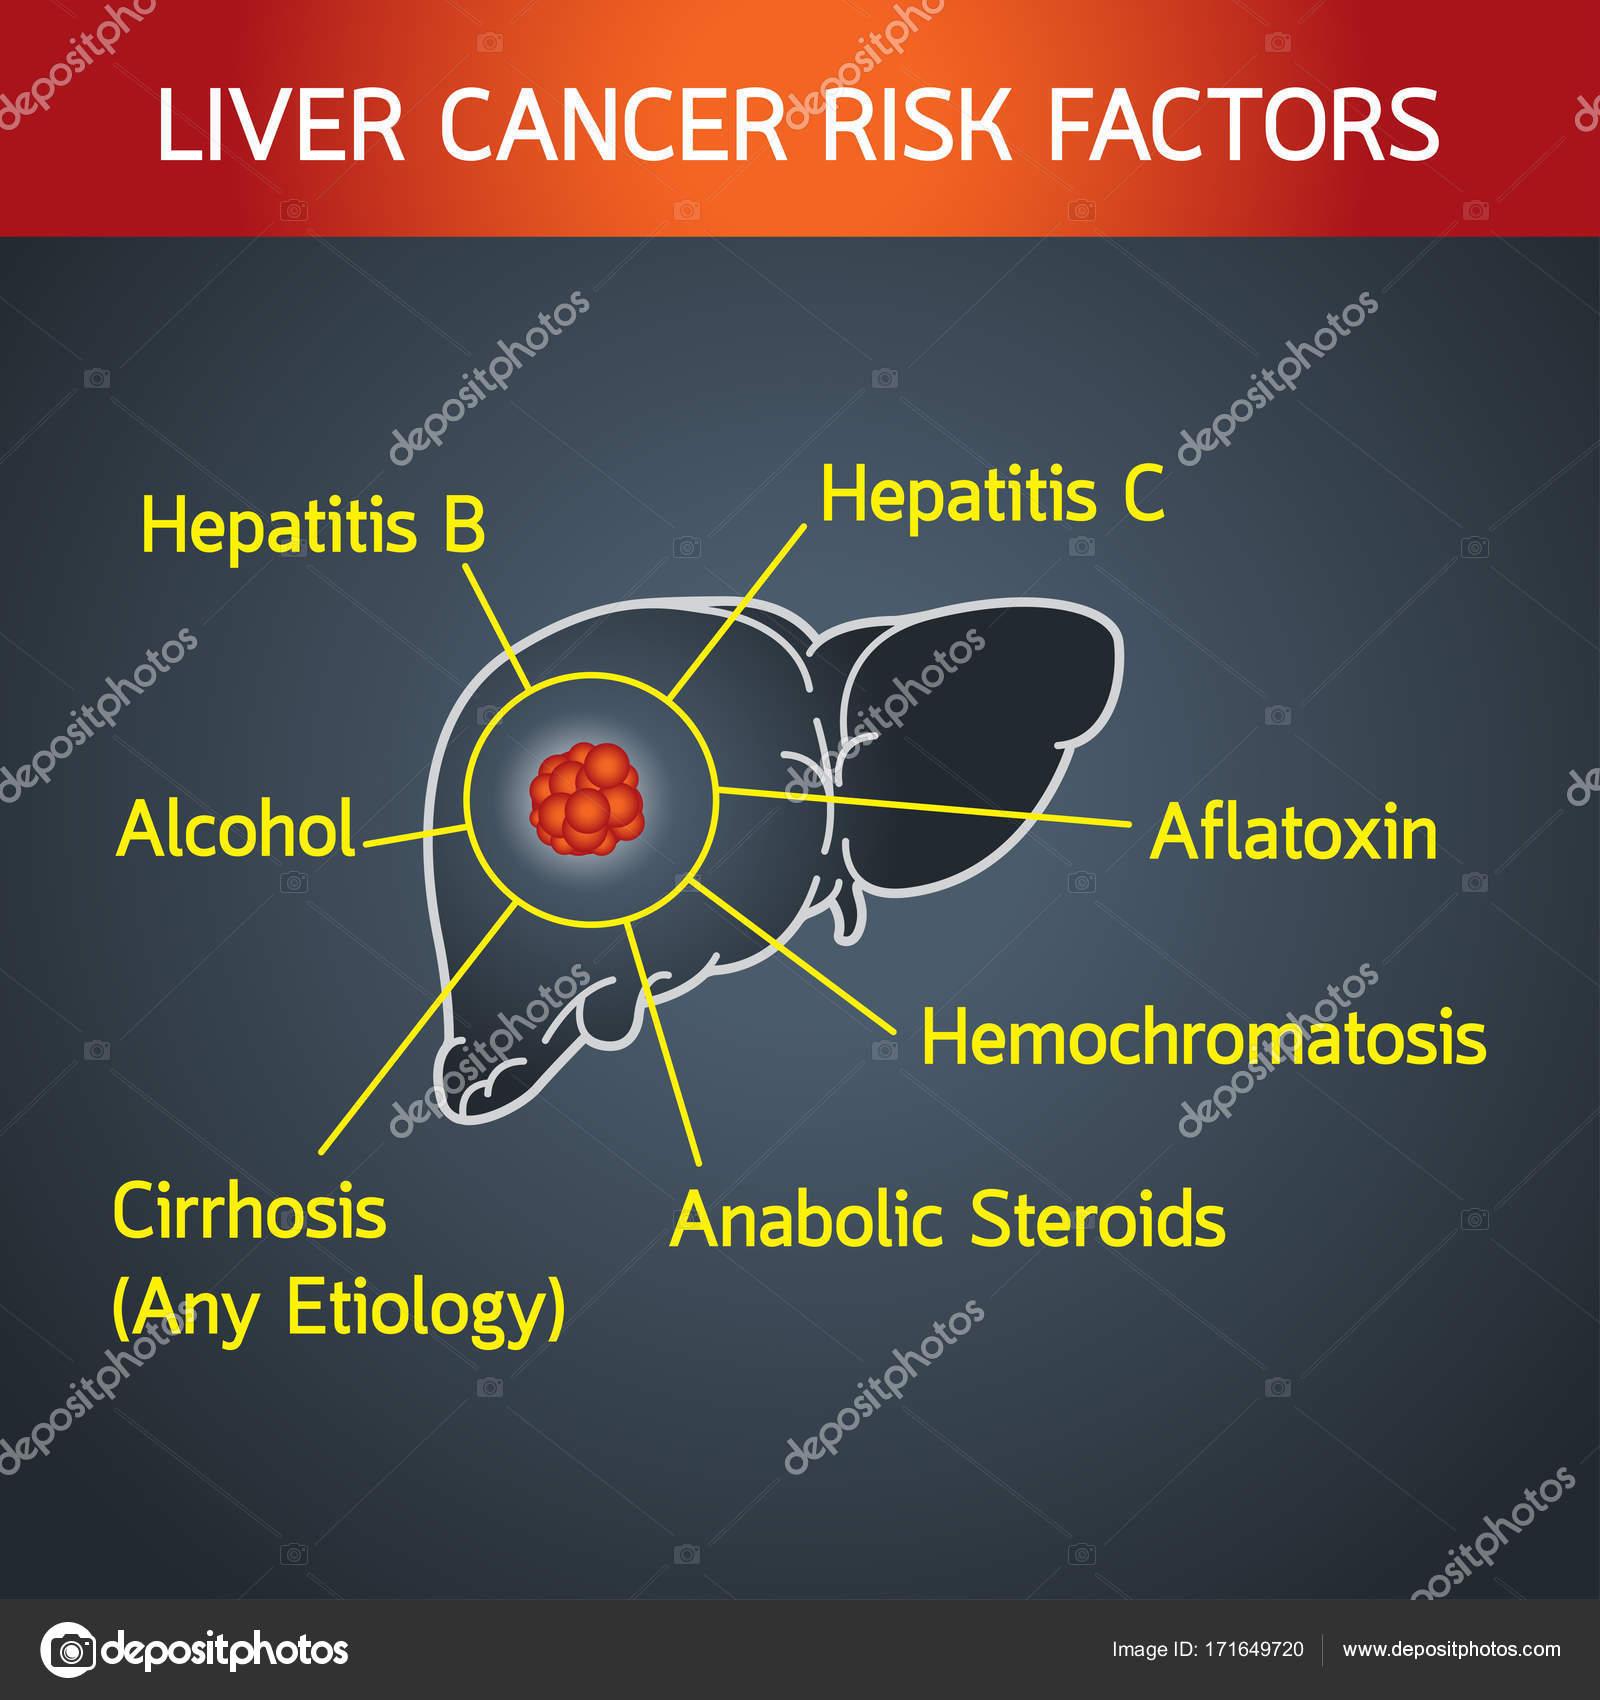 hepatic cancer risk factors)